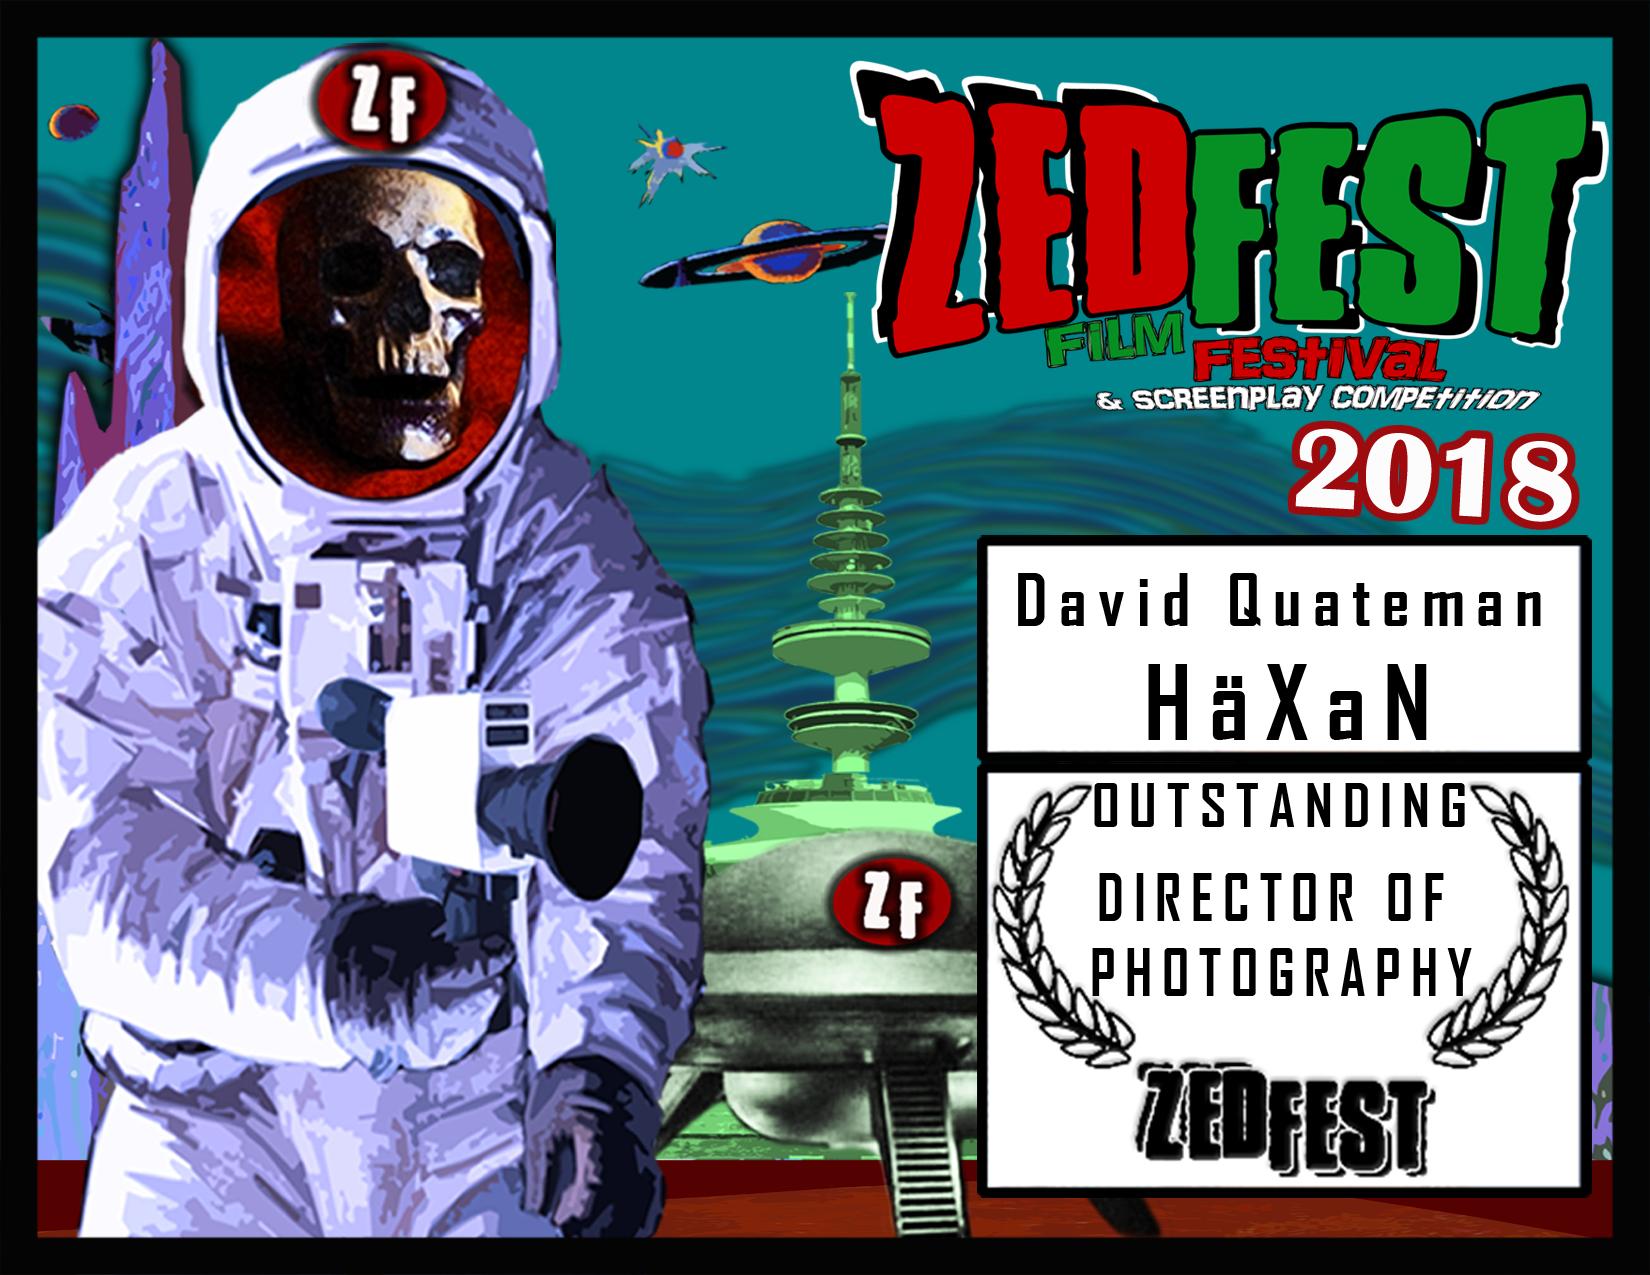 Zed Fest 2018 David Quateman Award Certificate copy.png